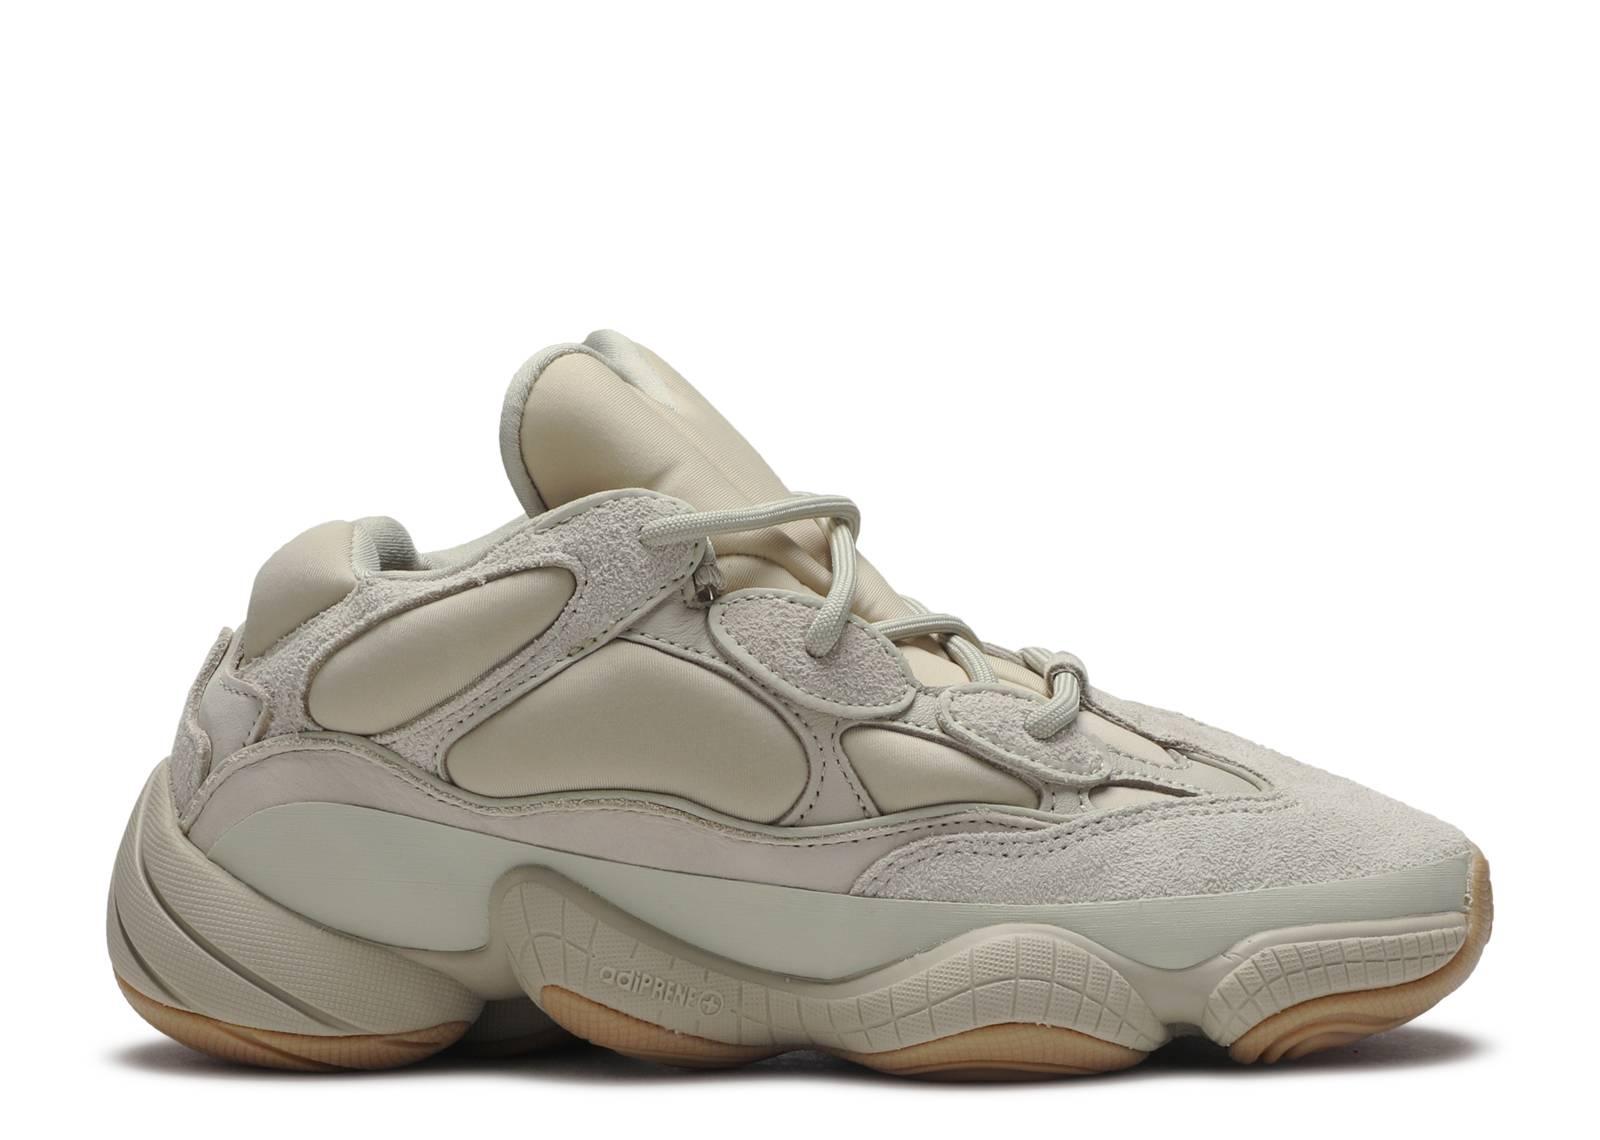 alguna cosa periscopio federación  Yeezy 500 'Stone' - Adidas - FW4839 - stone/stone/stone   Flight Club